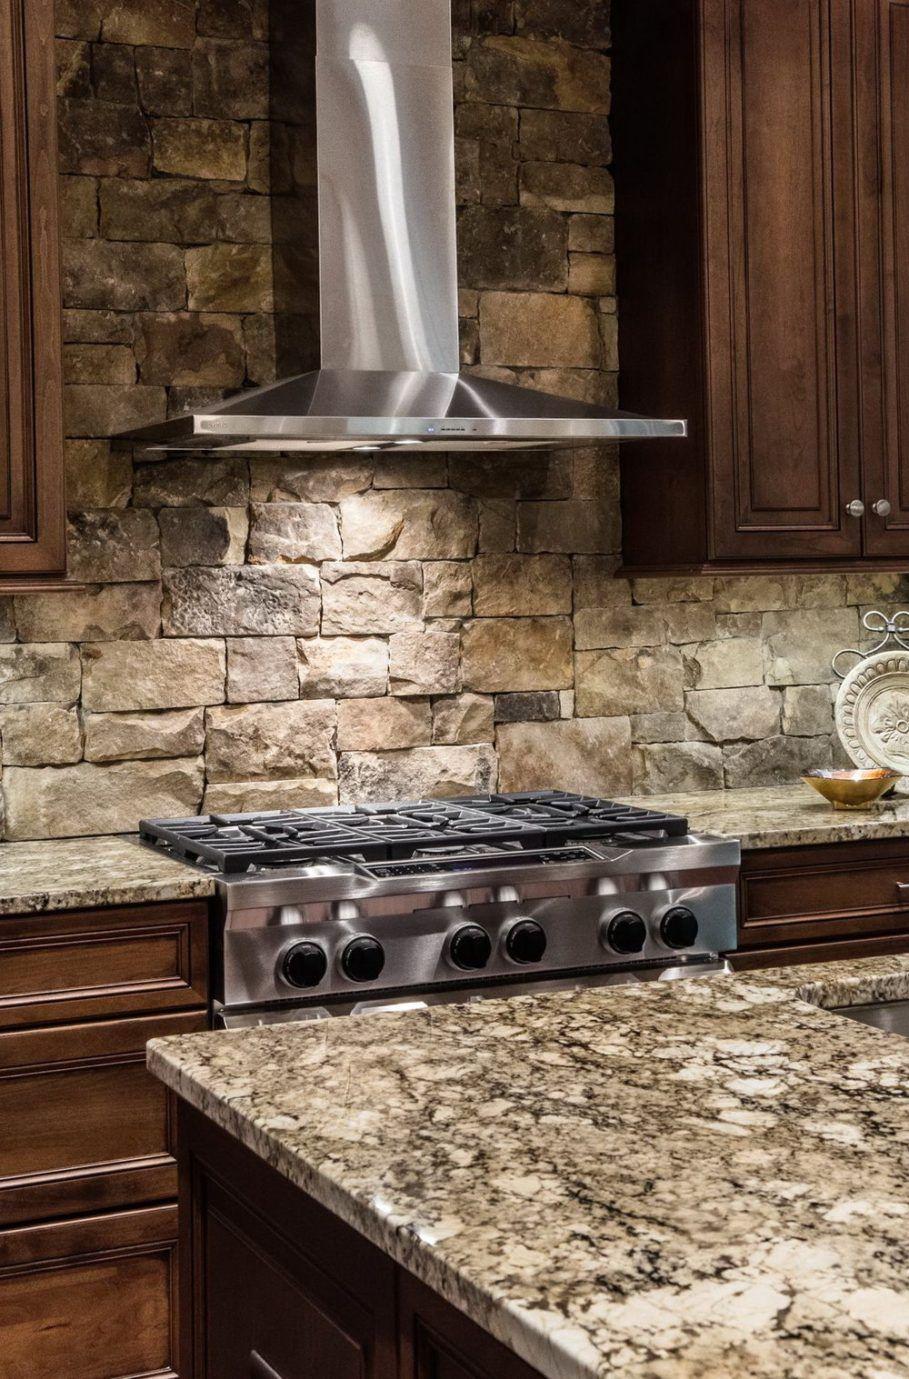 Cozy Stone Kitchen Backsplash Tile Home Design Ideas